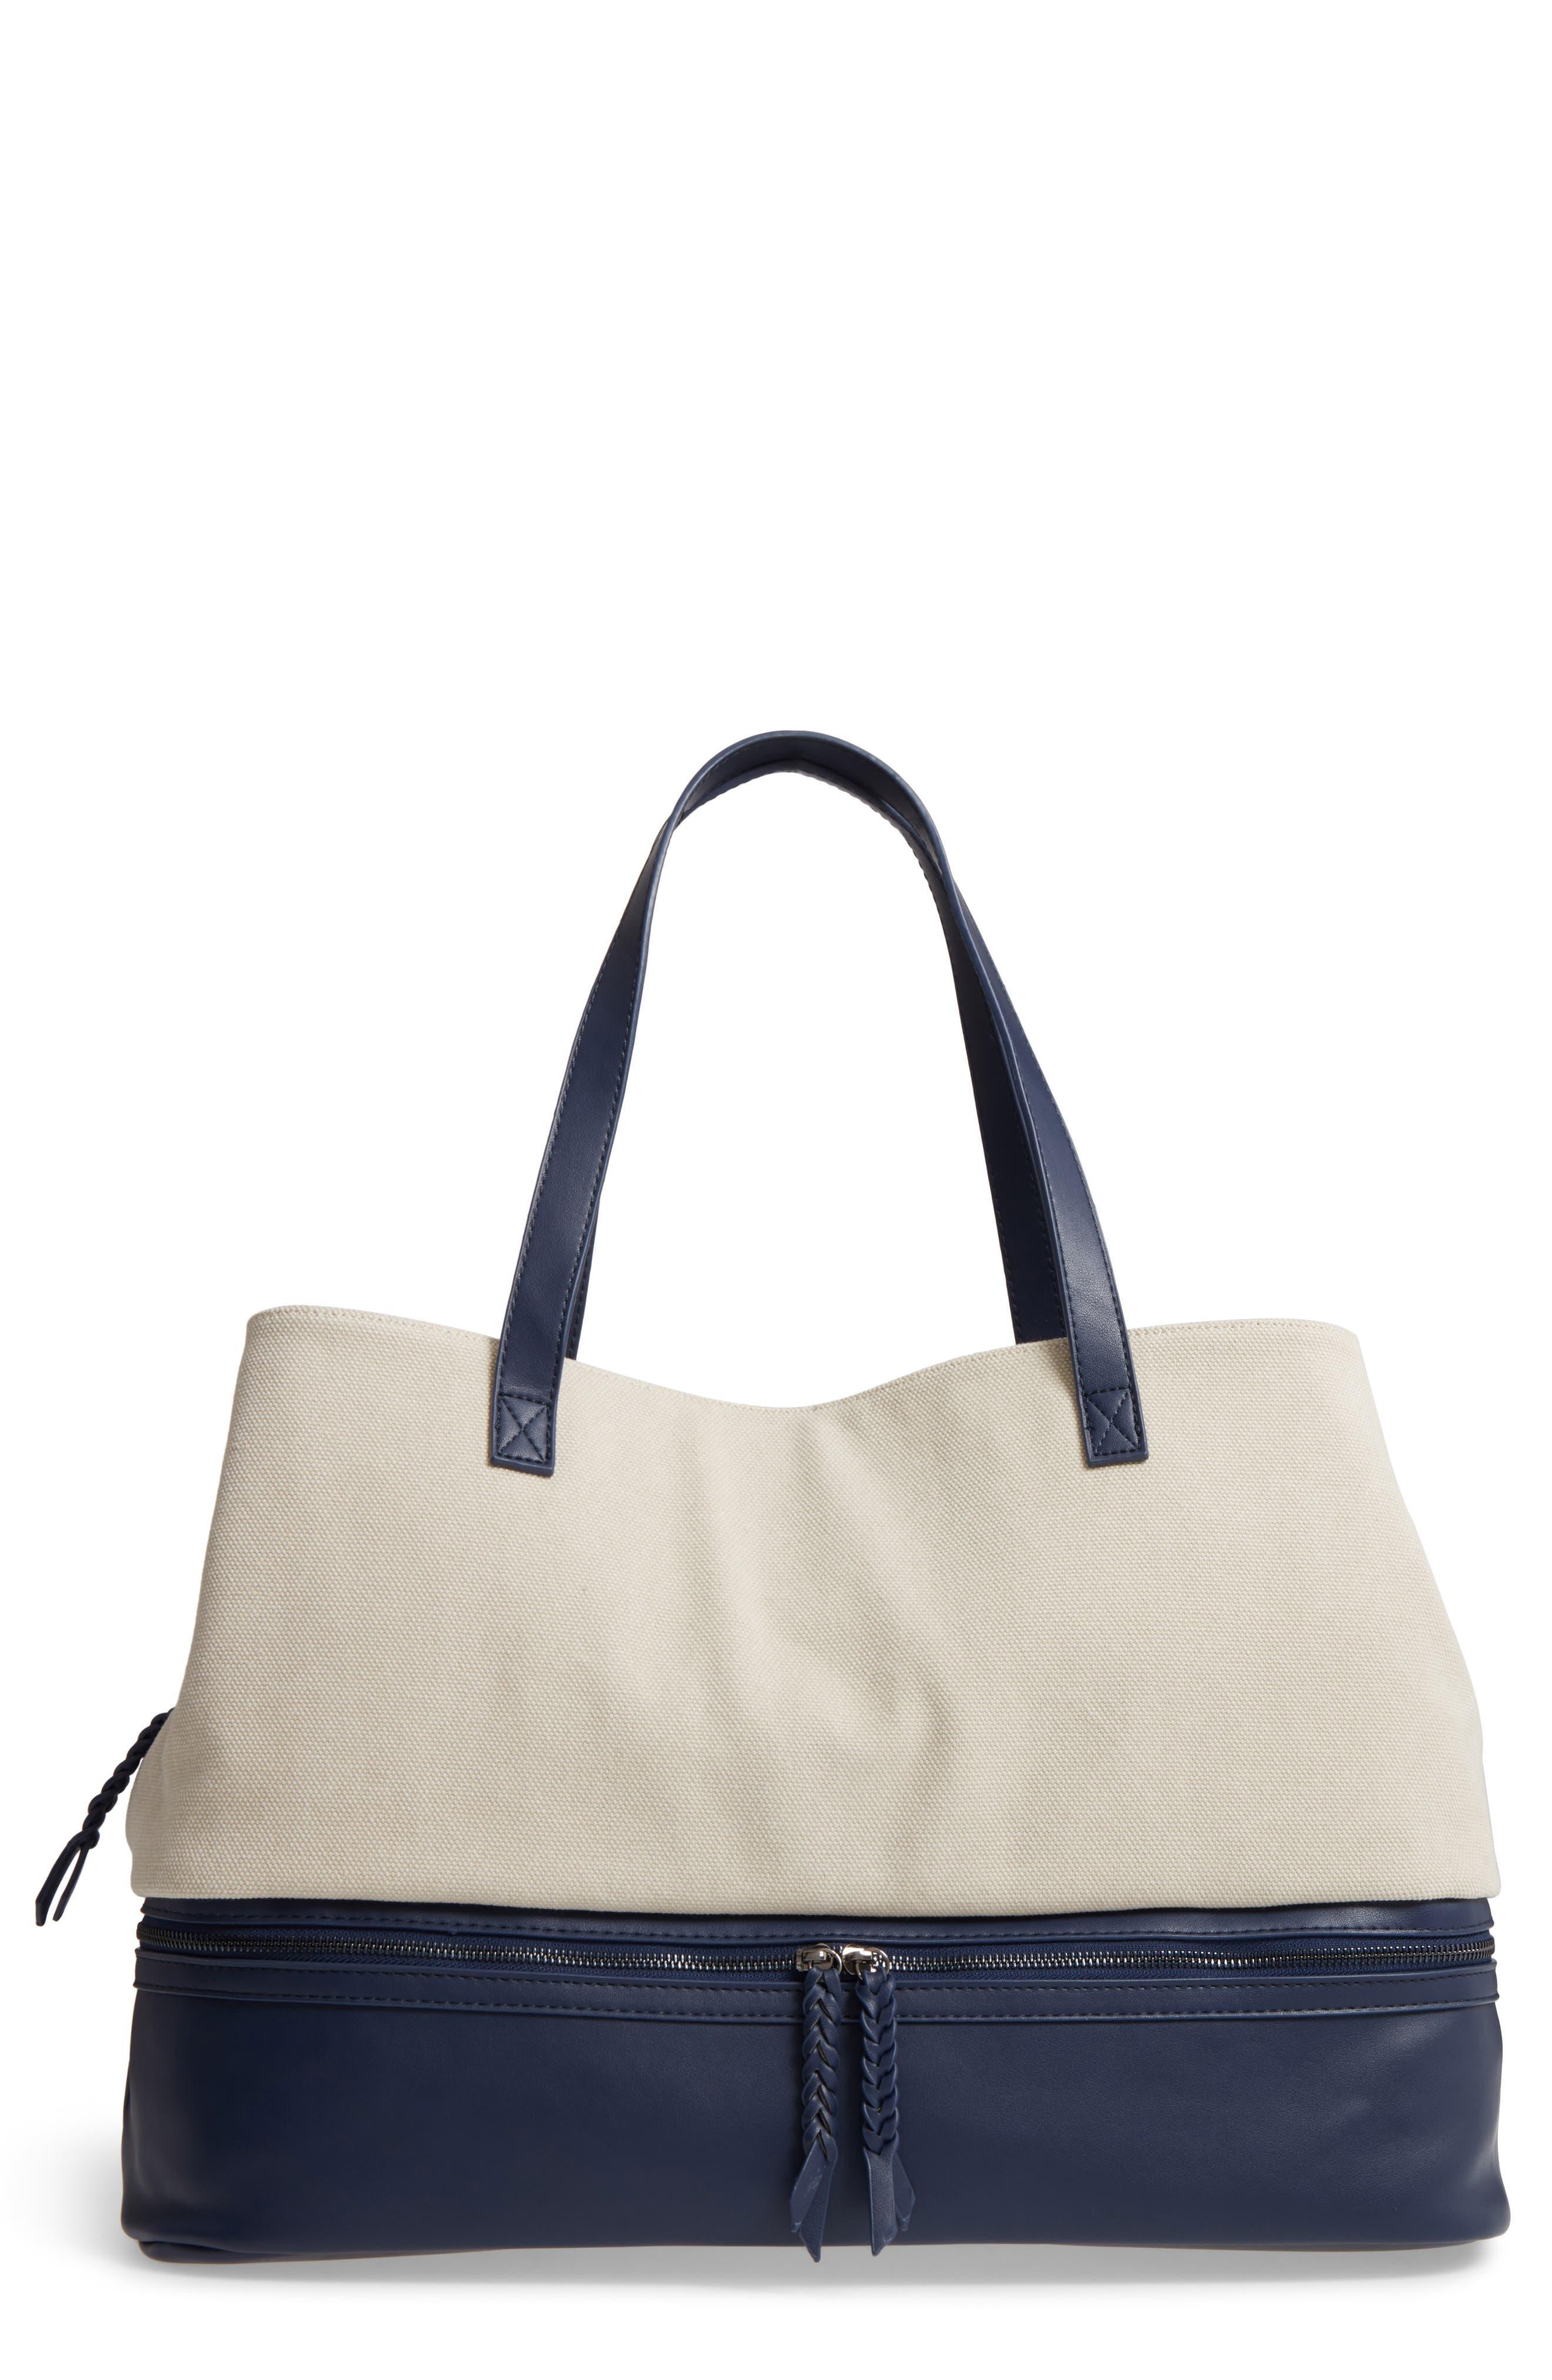 Two Toned Weekender Bag,                             Main thumbnail 1, color,                             Cream/ Navy